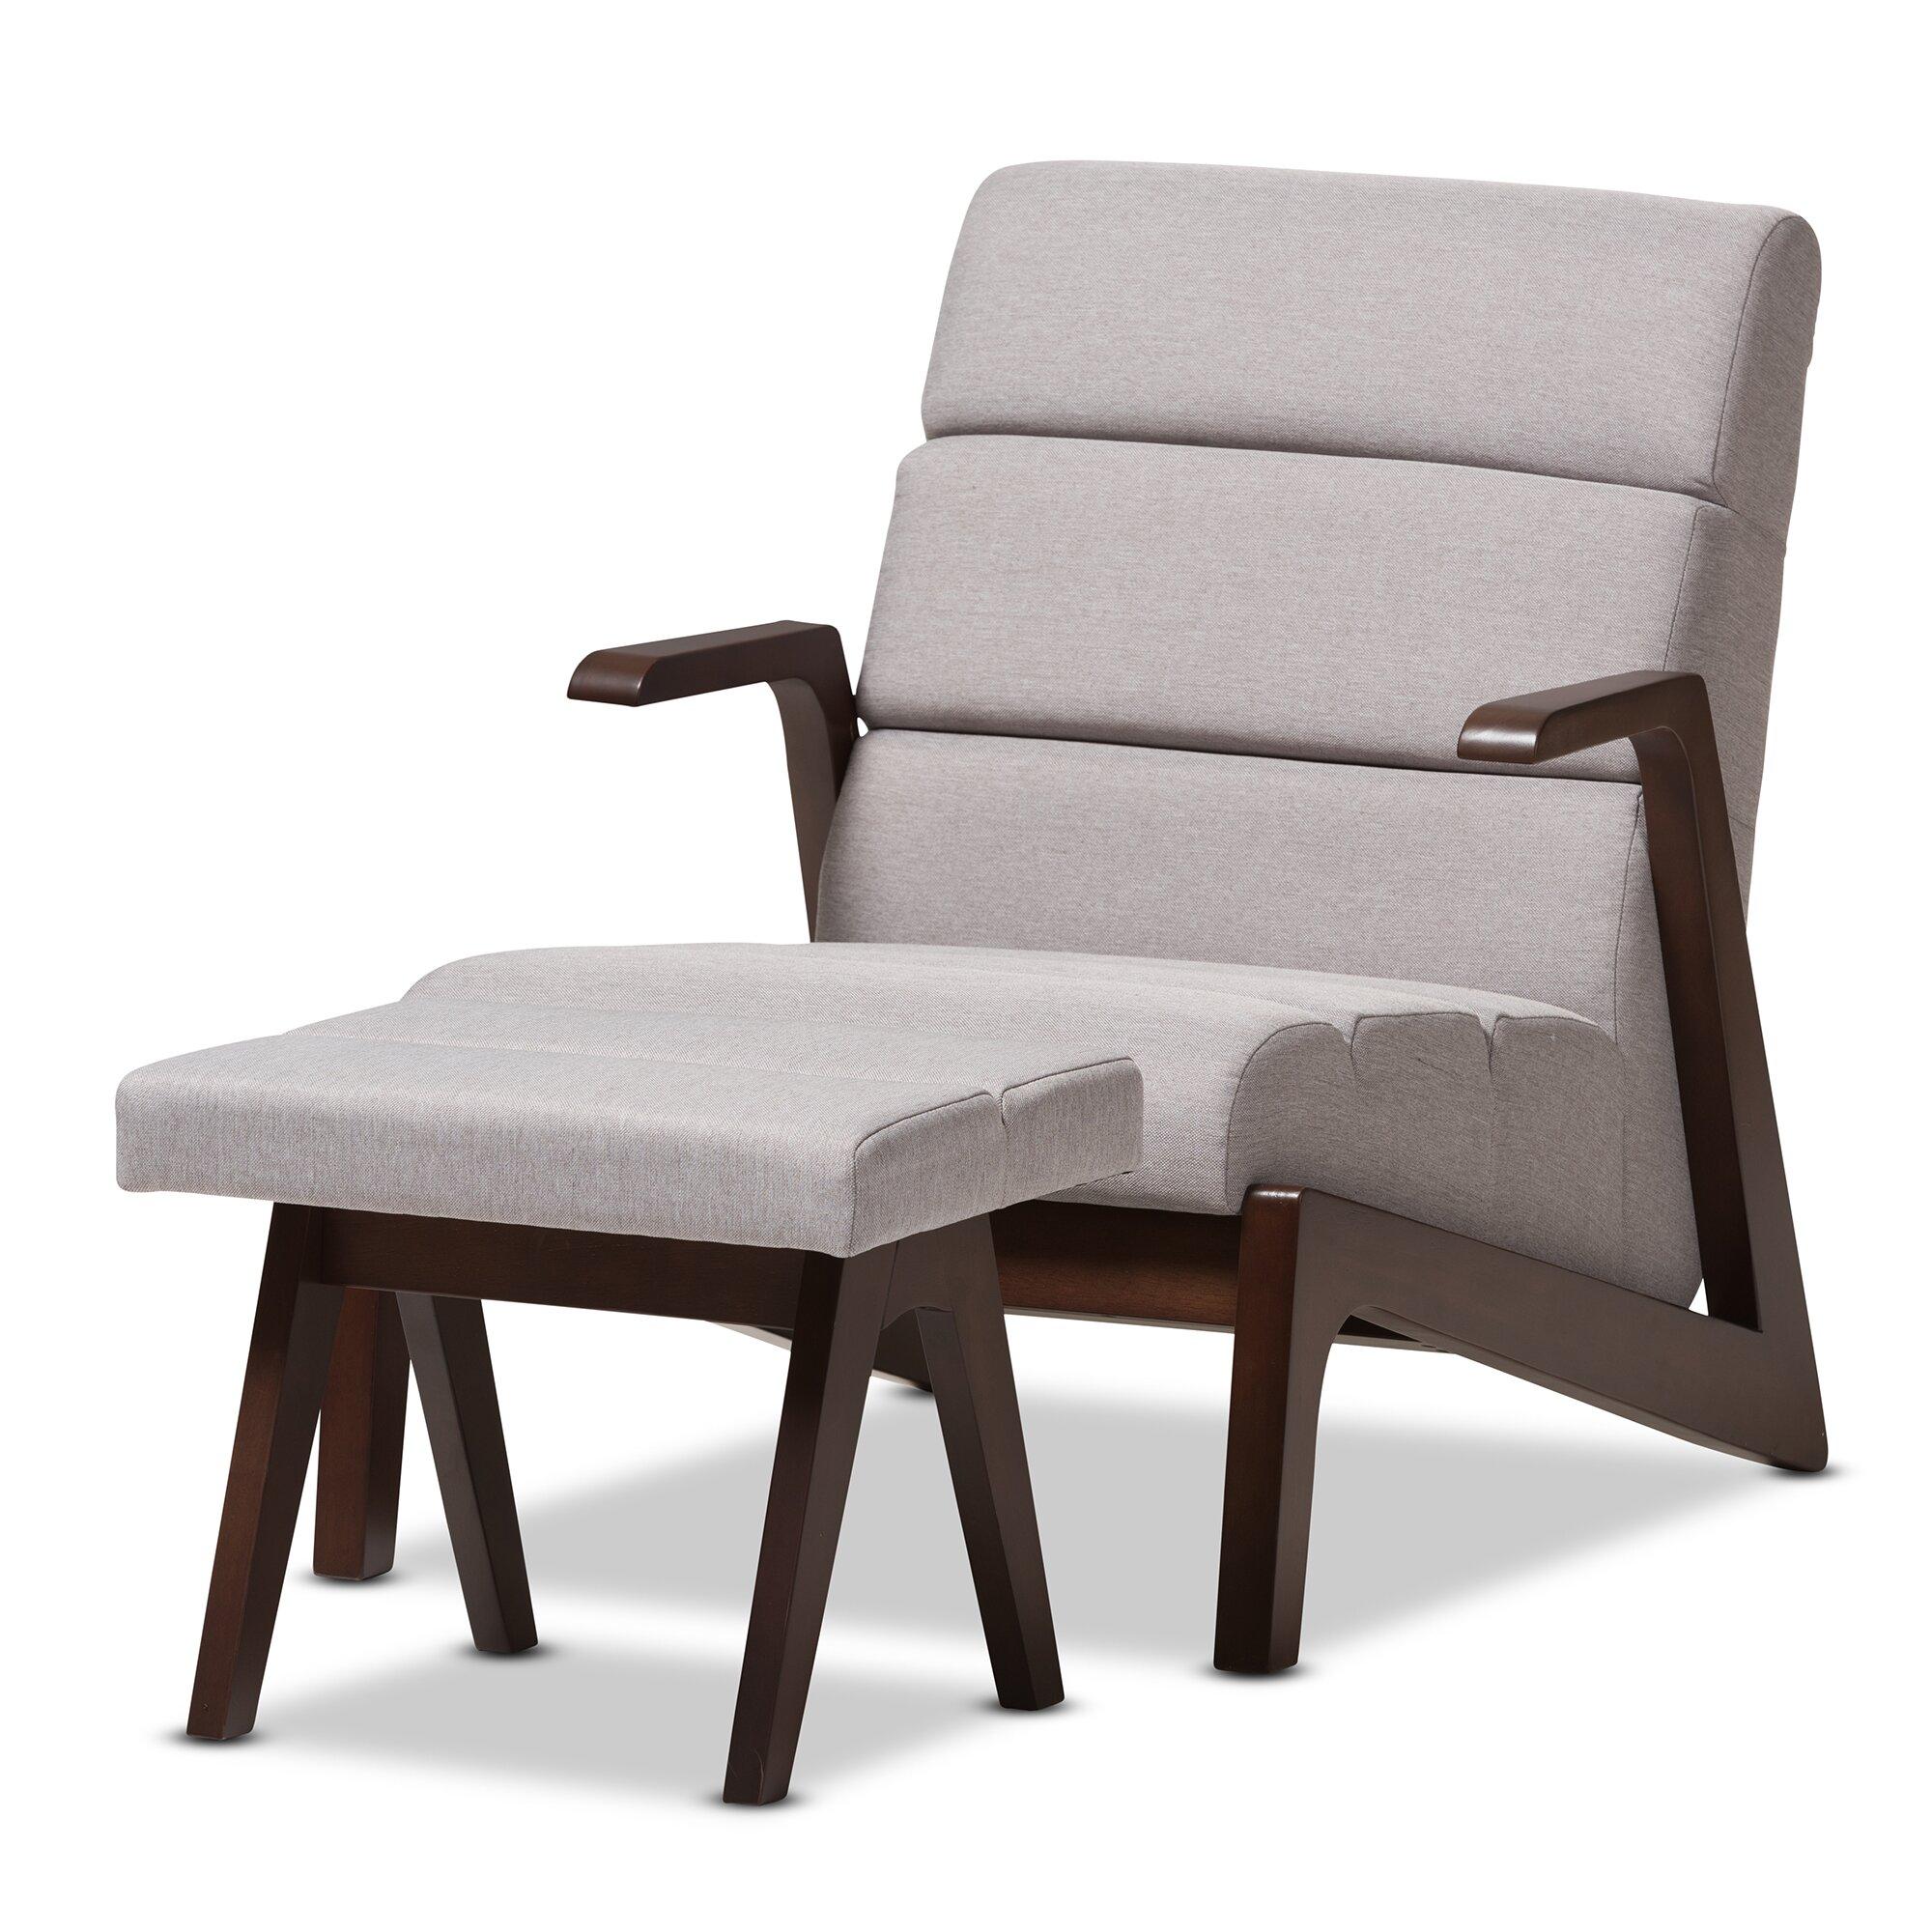 Wholesale interiors lazzaro mid century modern lounge - Mid century modern chair and ottoman ...